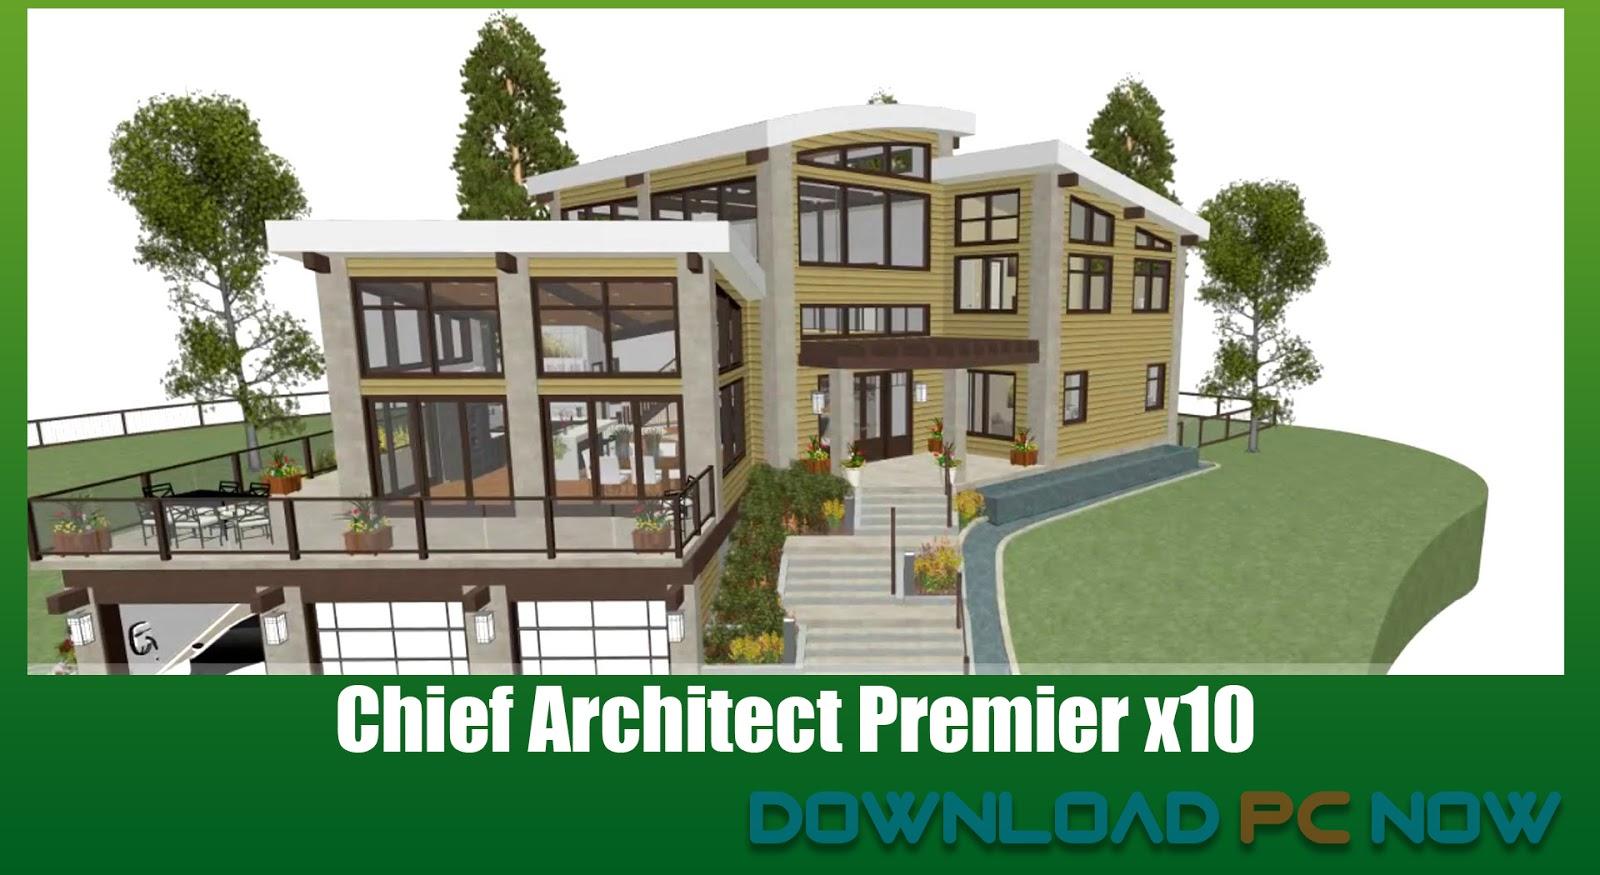 Chief architect home designer pro 10 vs premier review home decor for Chief architect home designer pro reviews